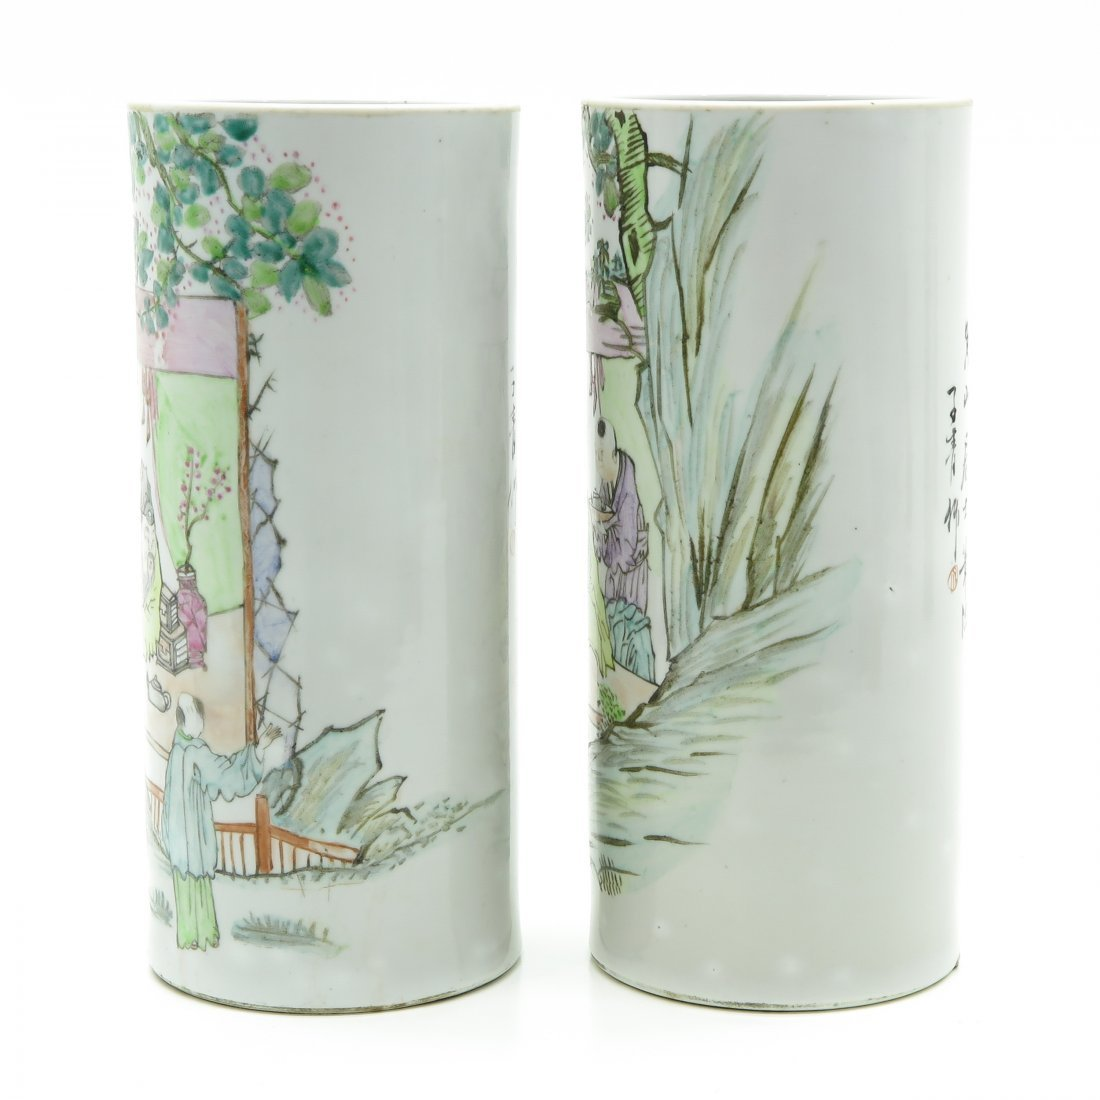 Lot of 2 China Porcelain Cylinder Roll Wagon Vases - 2